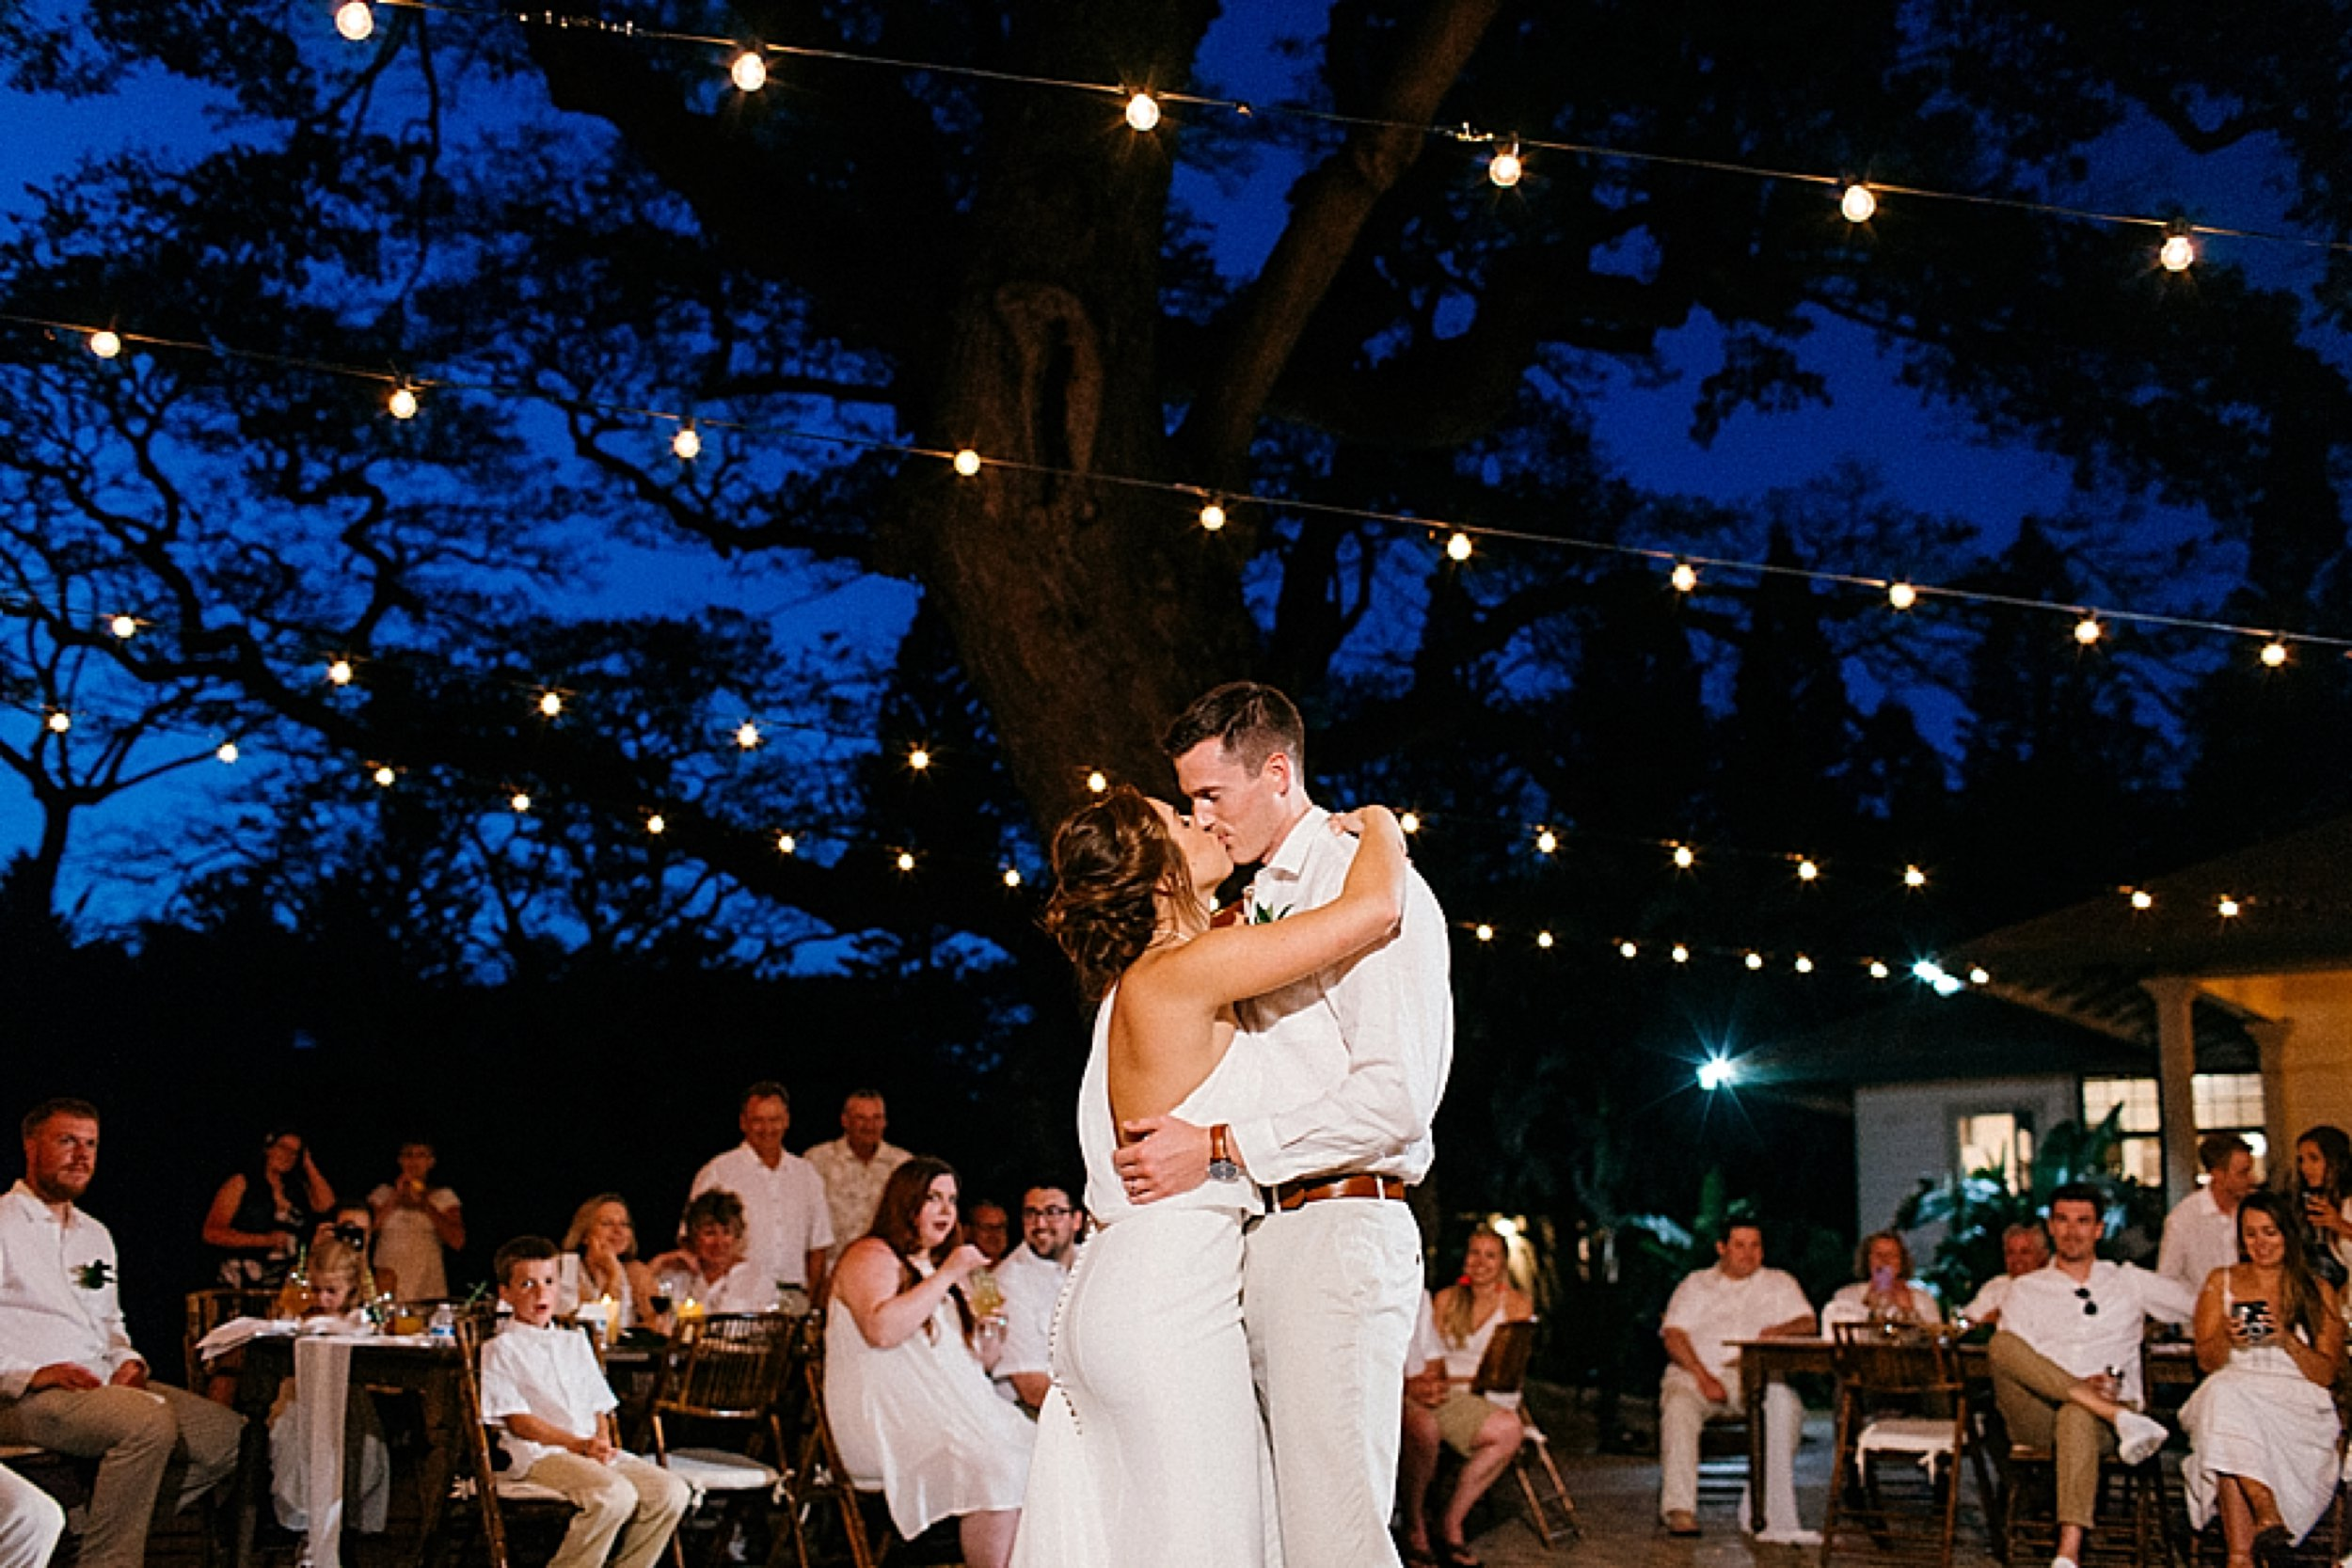 maui-wedding-at-olowalu-plantation-house_0107.jpg